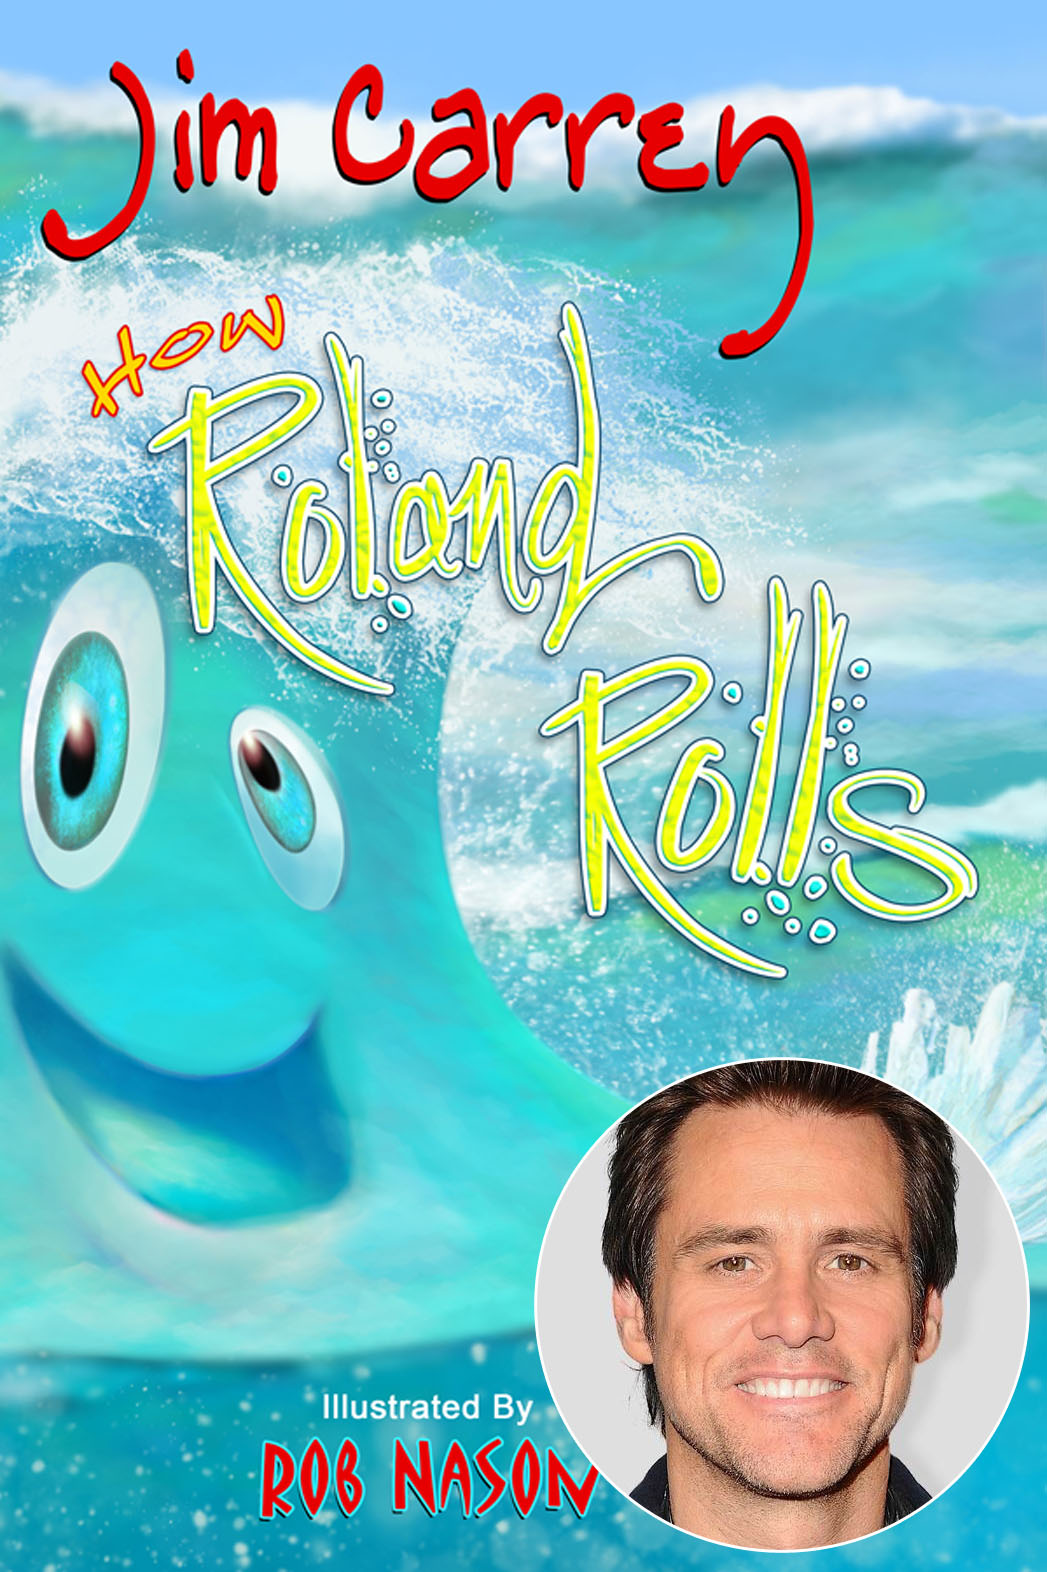 How Roland Rolls Jim Carrey Inset - P 2013